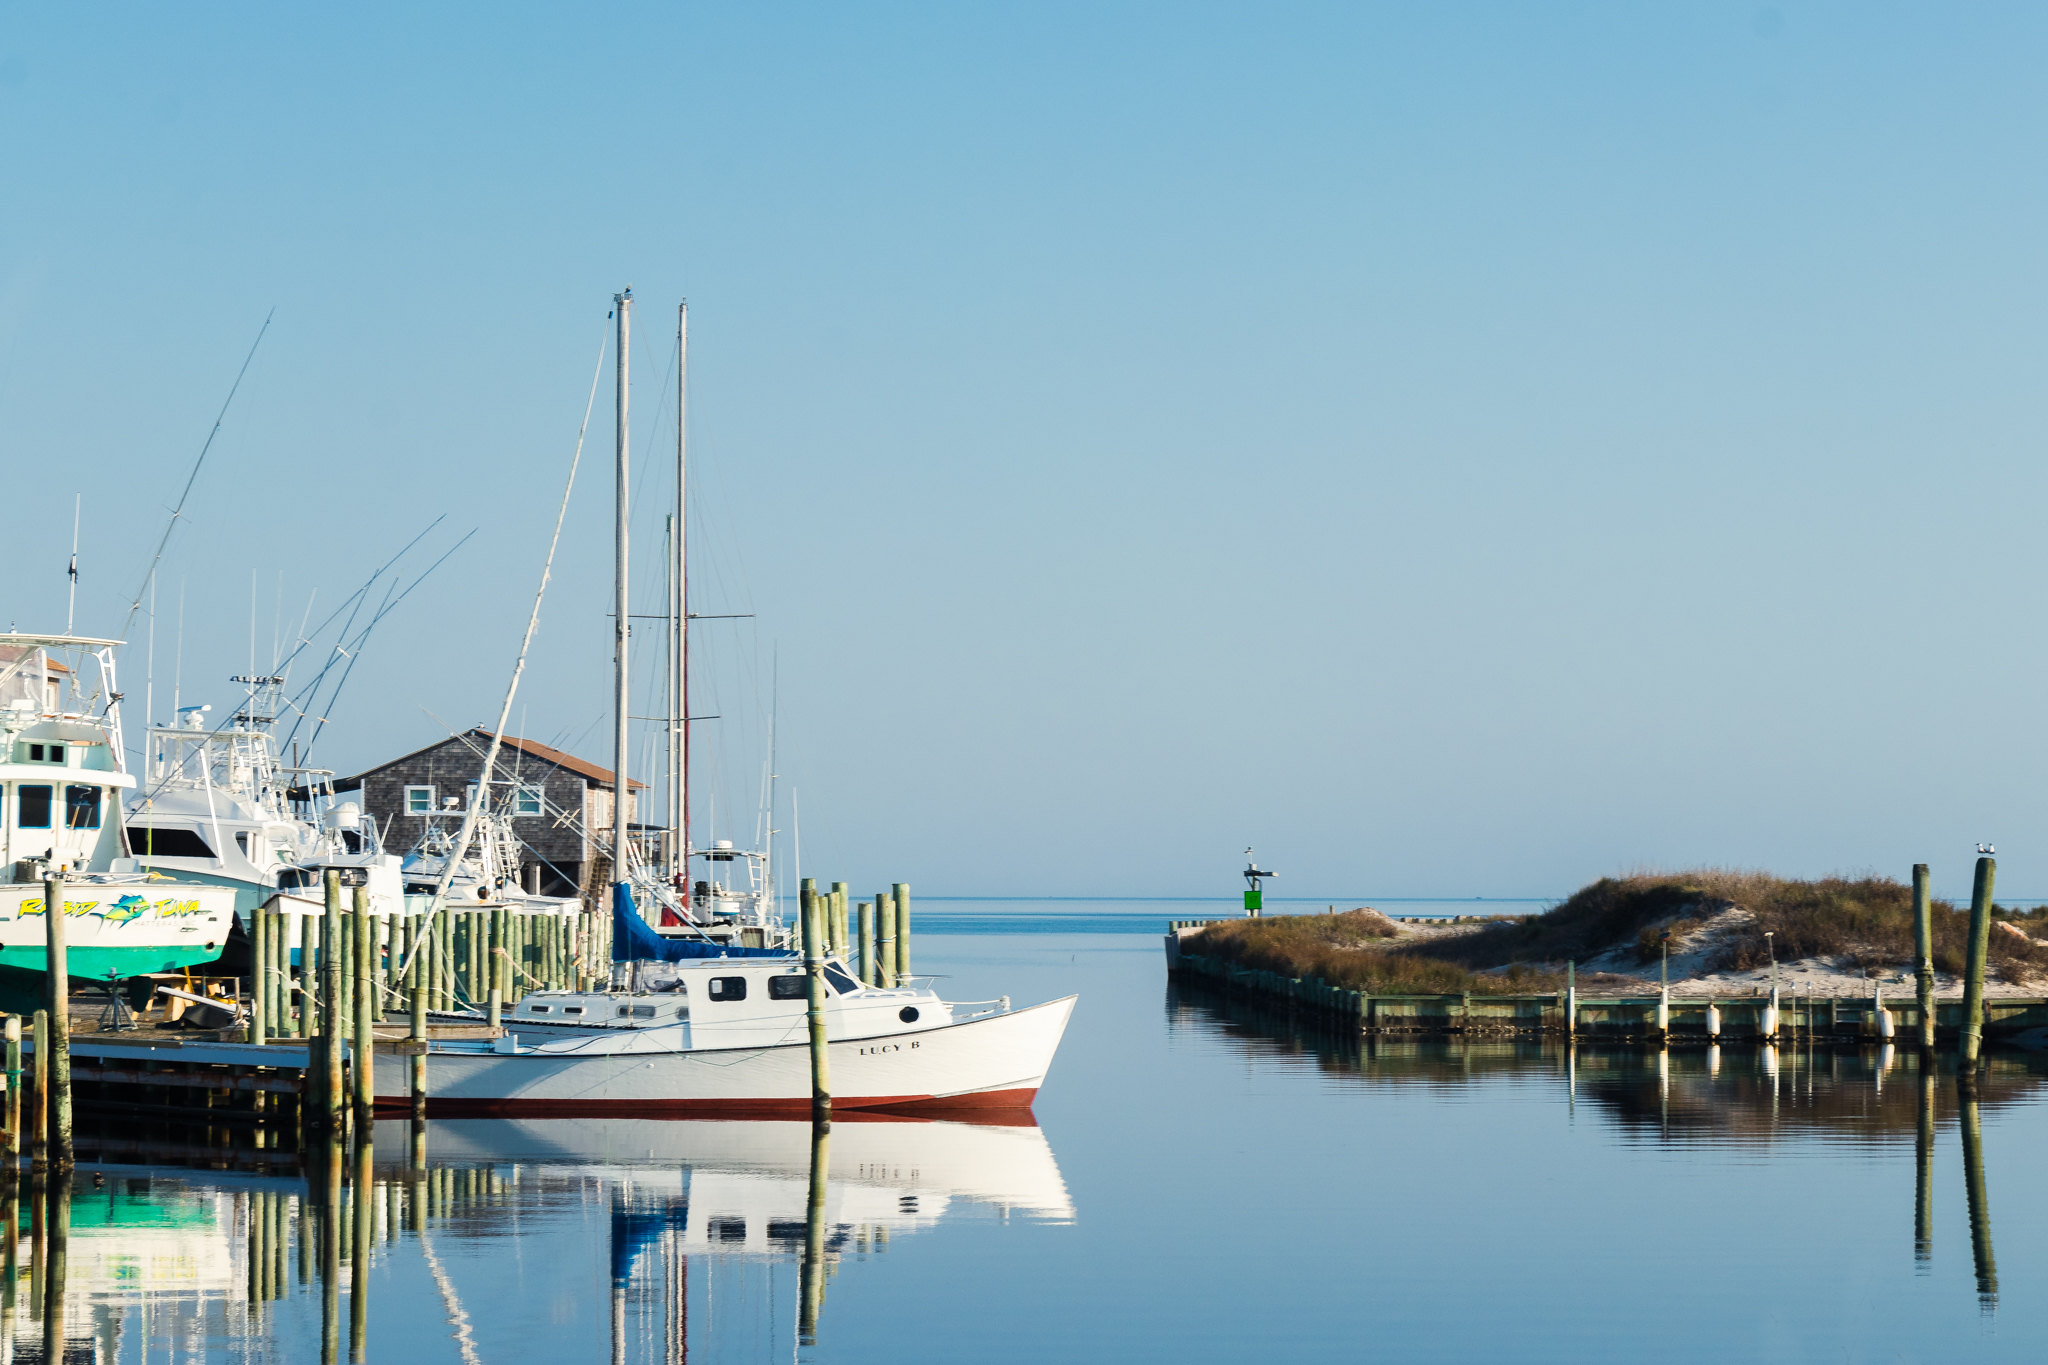 Take a Day Trip to Ocracoke Island